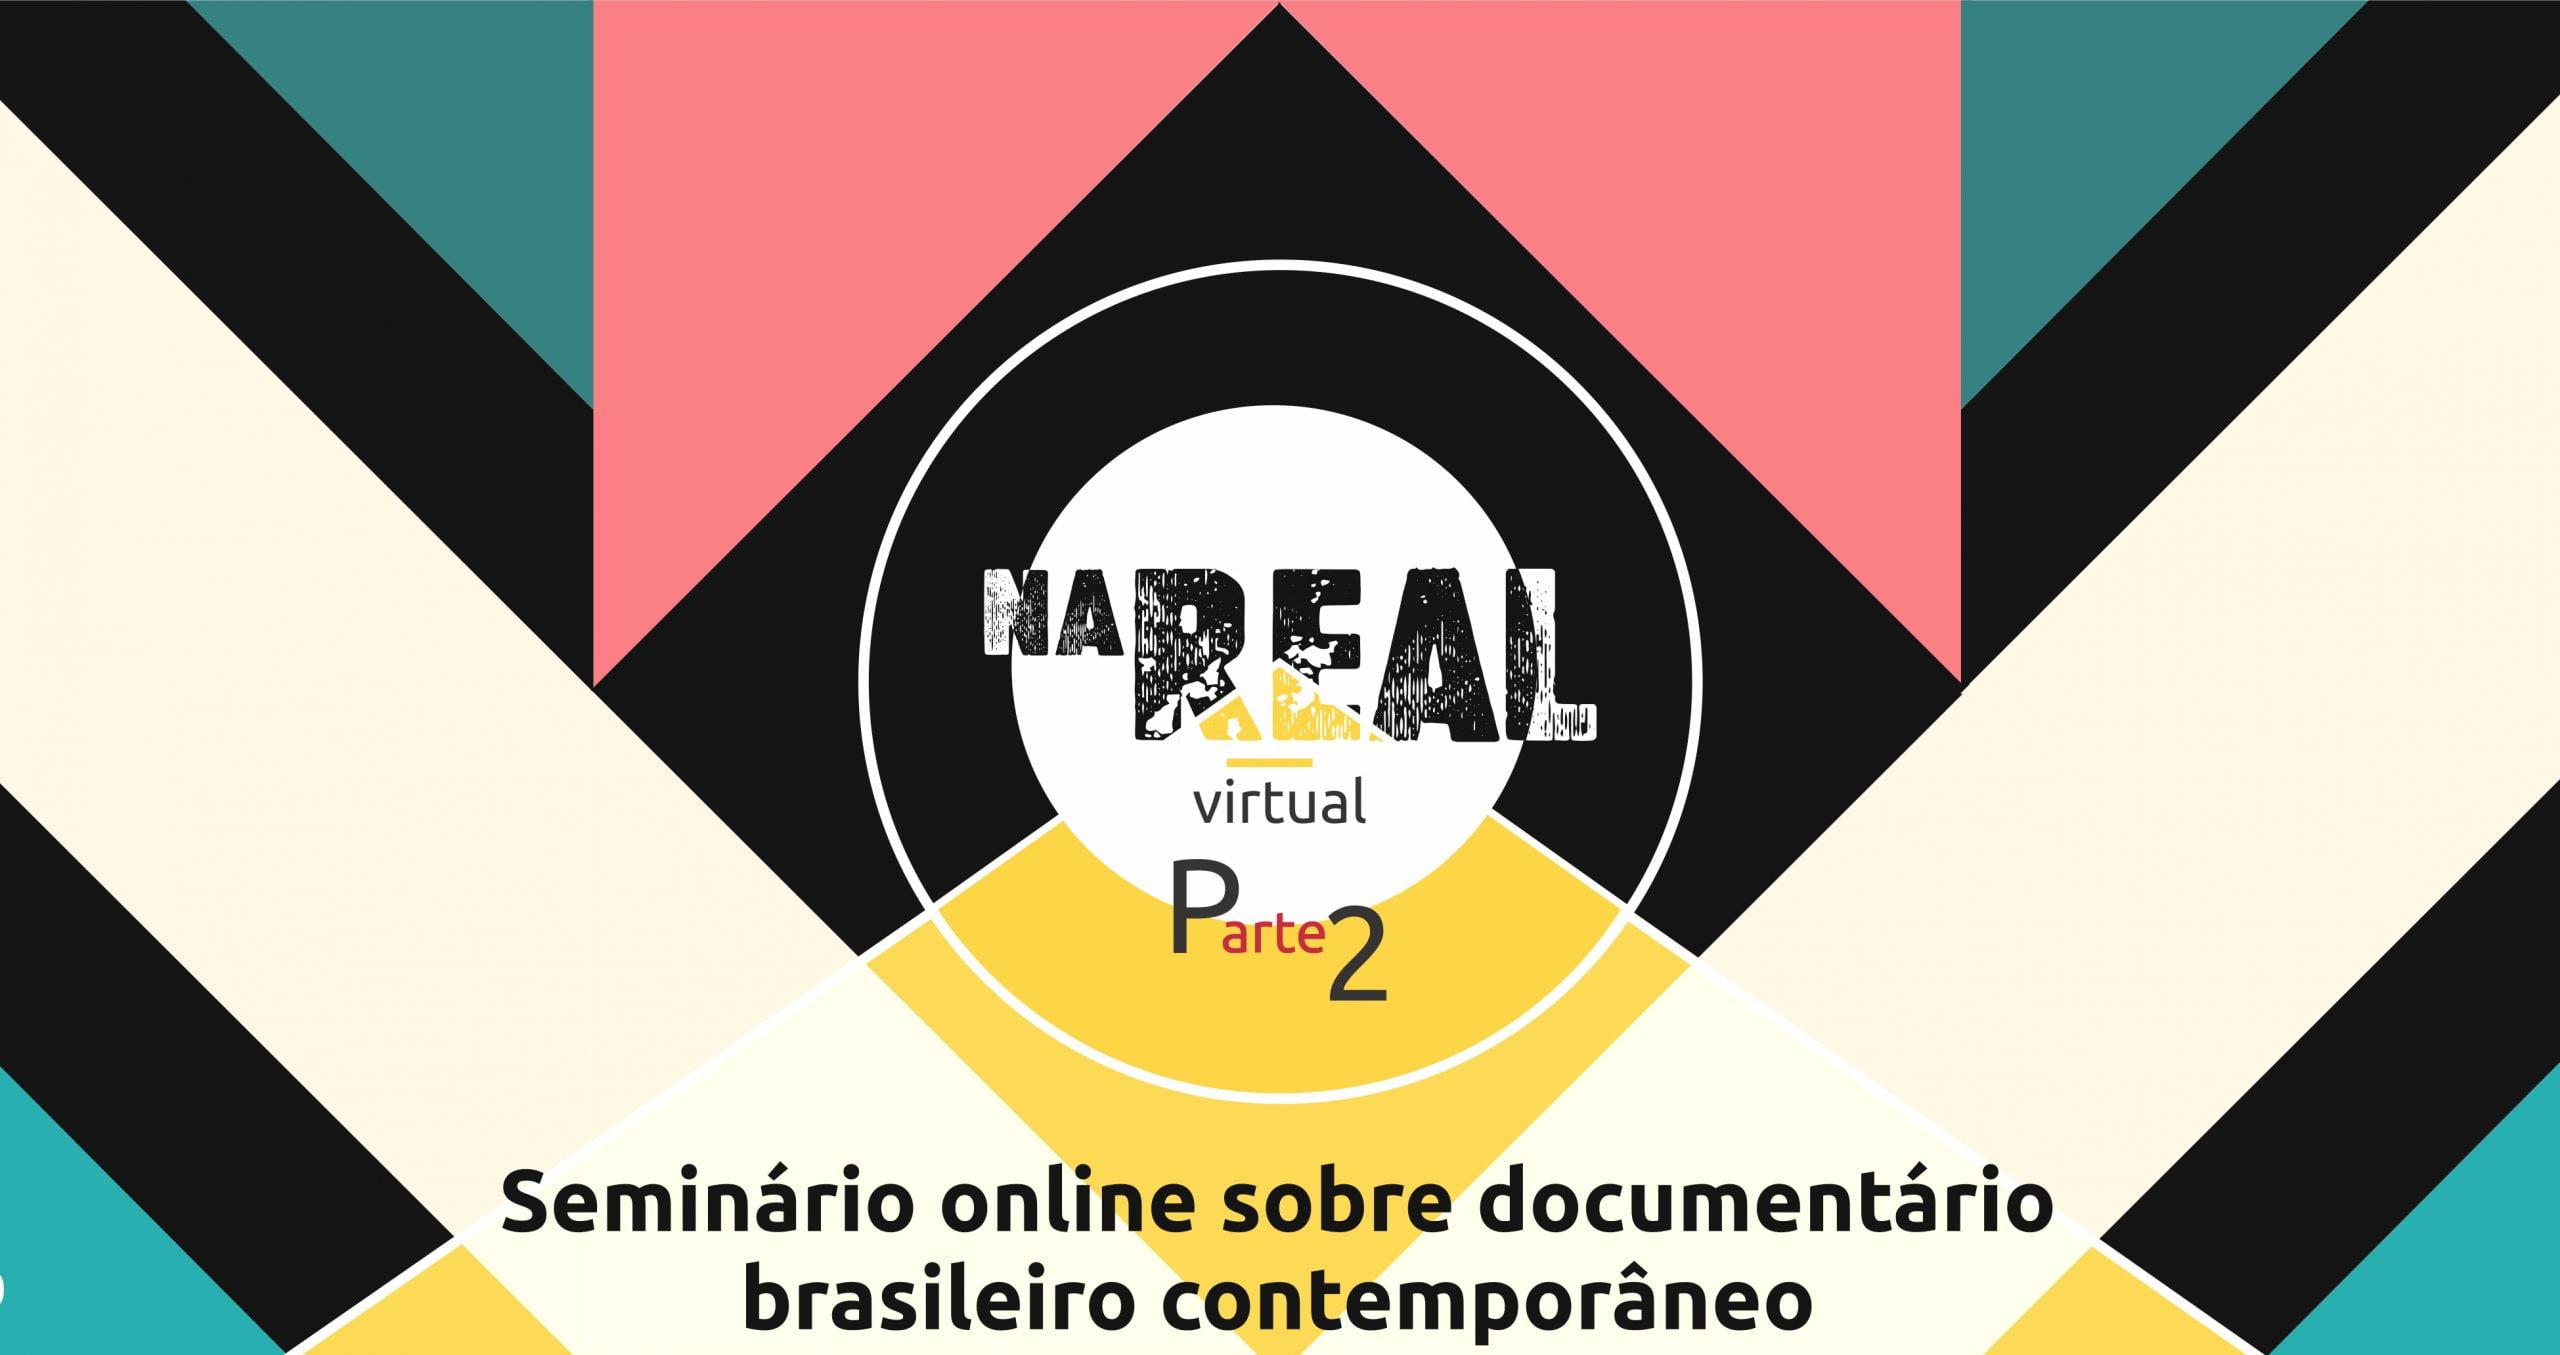 Desconto de 5% para Alunos, Ex-Alunos e Professores no evento Na Real_Virtual –  Parte 2